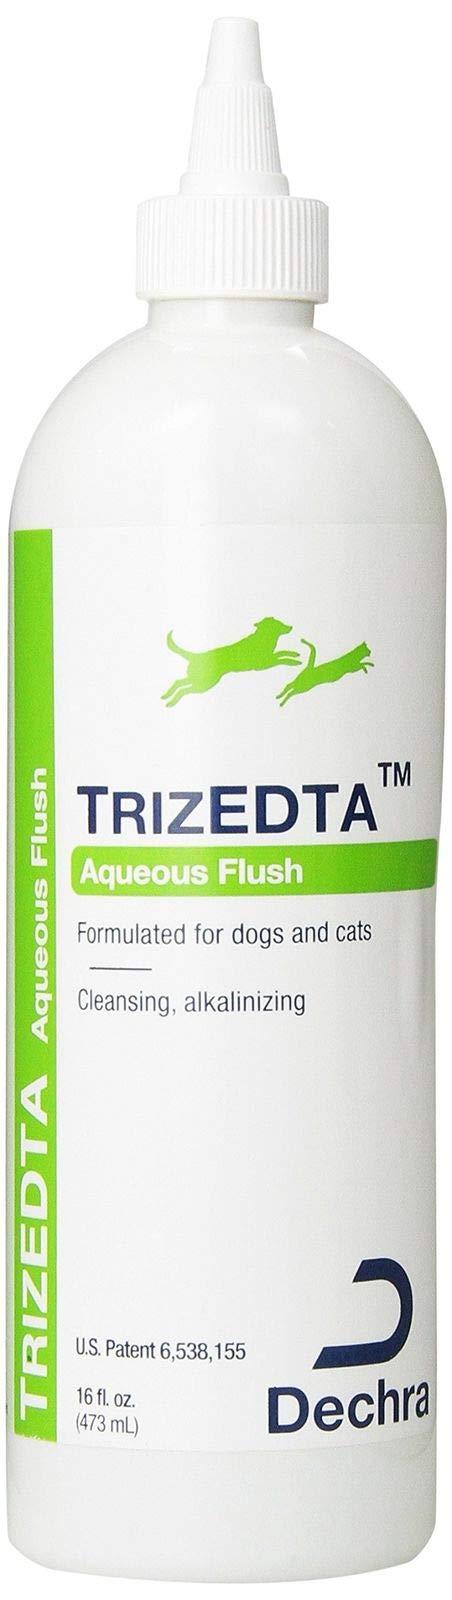 Dechra TrizEDTA Aqueous Flush for Cats and Dogs 16 oz by Dechra (Image #1)